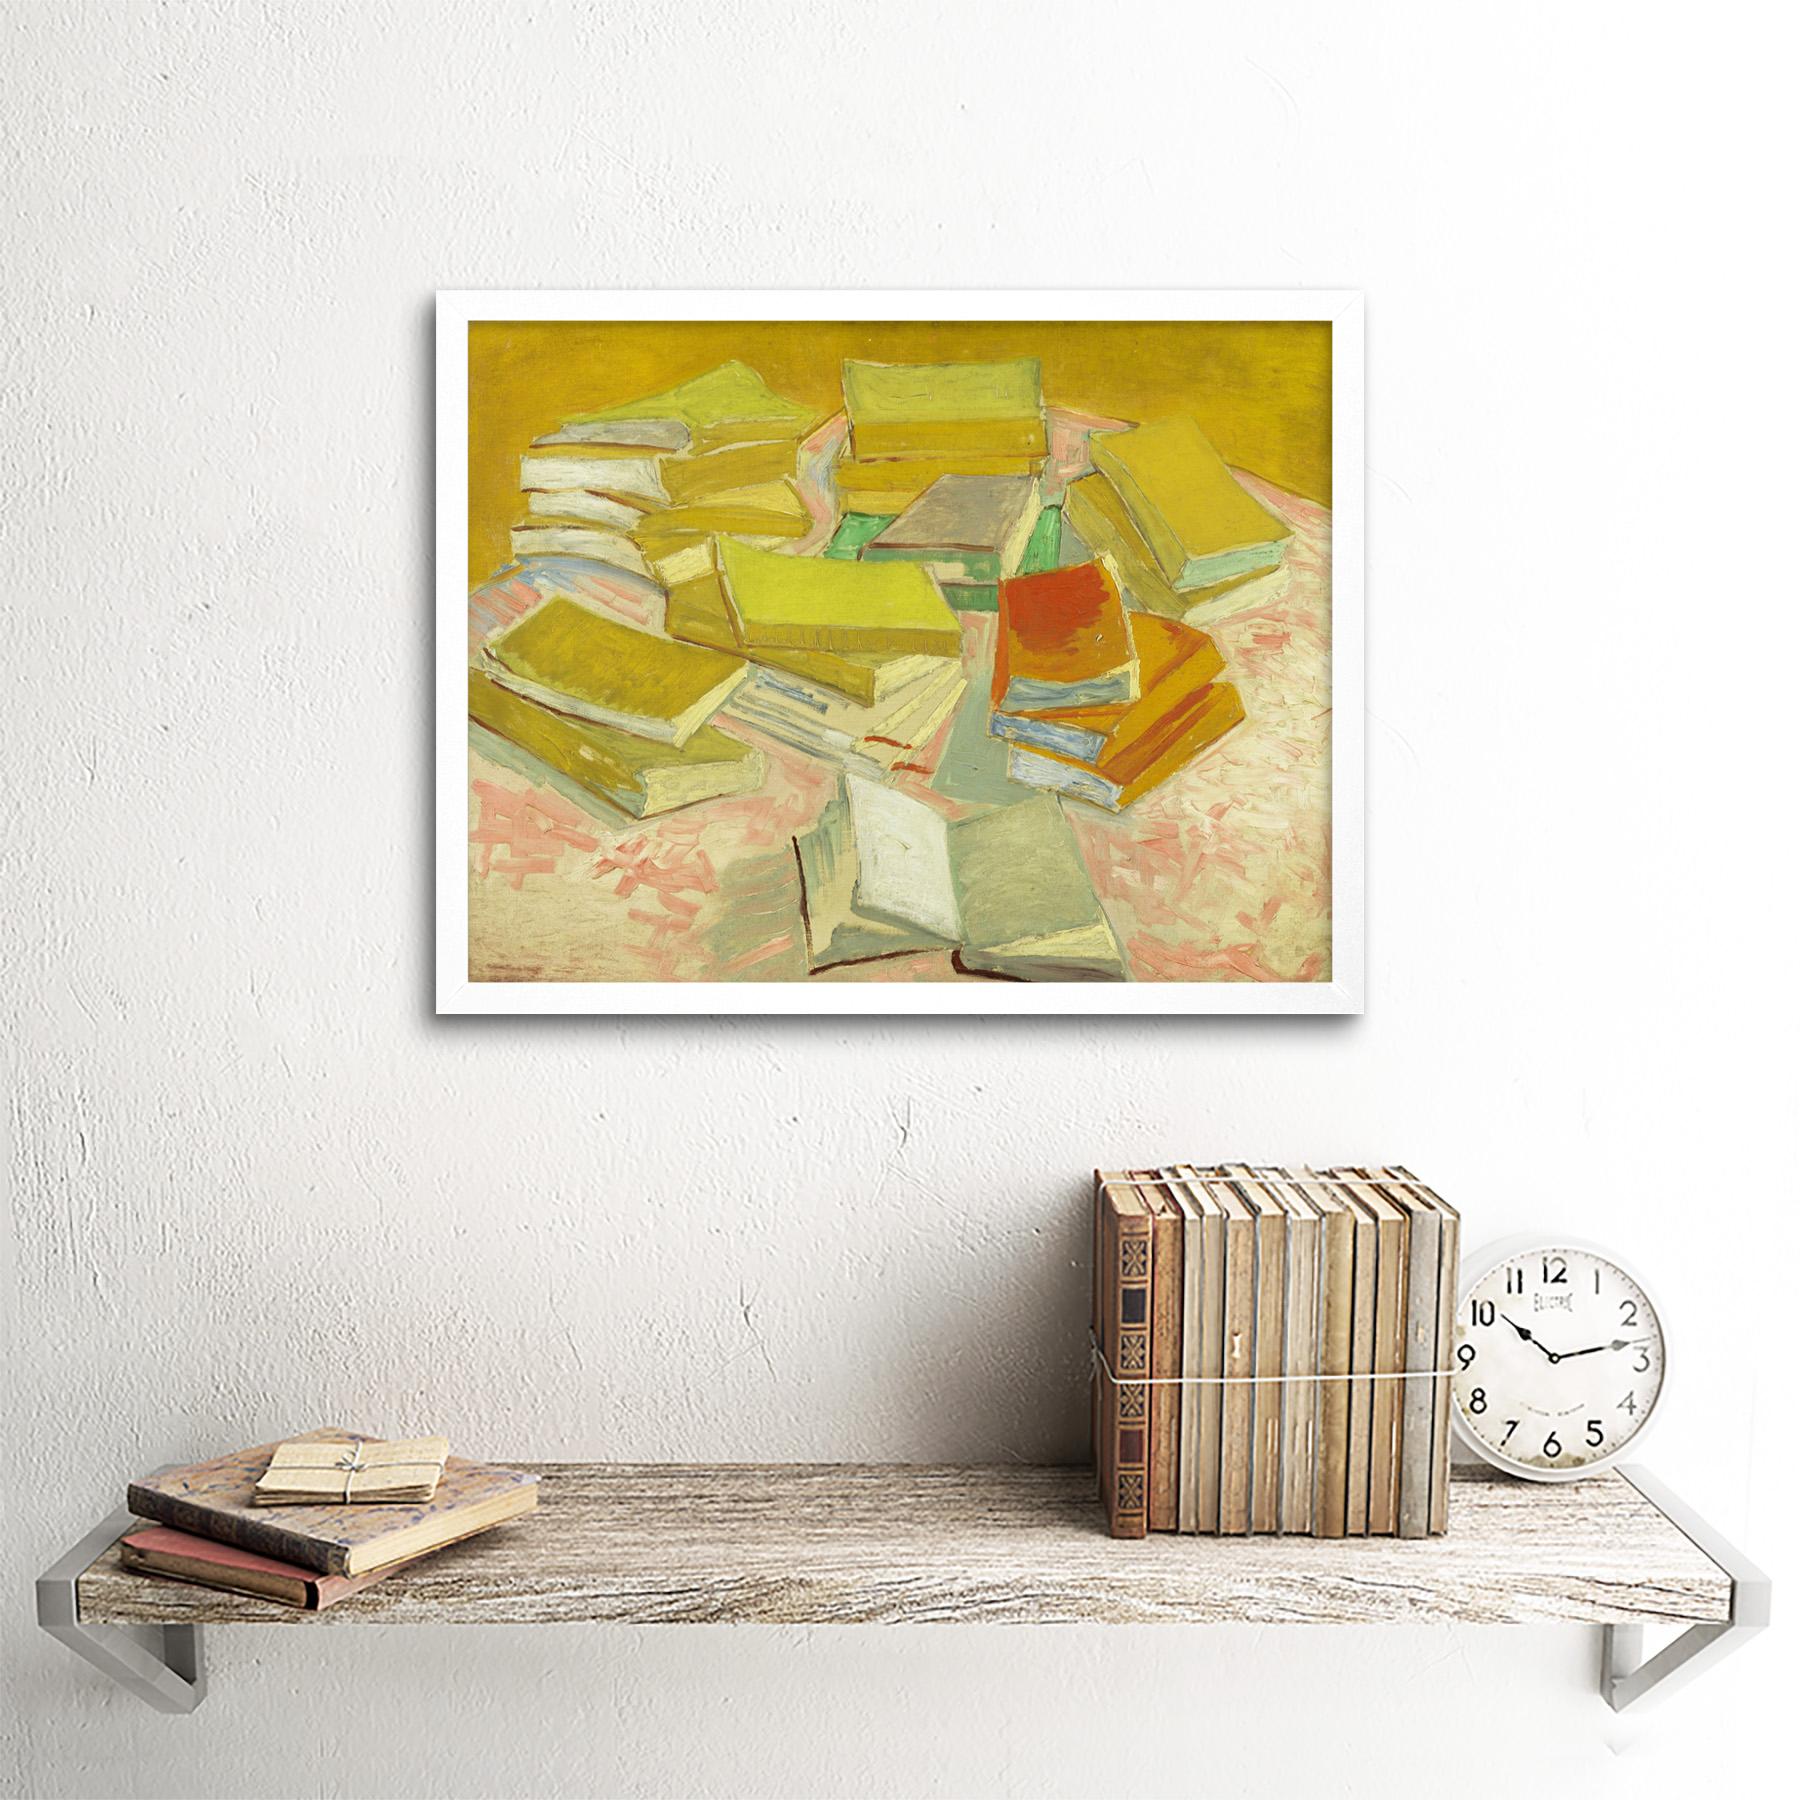 thumbnail 18 - Vincent-Van-Gogh-Piles-Of-French-Novels-Art-Print-Framed-12x16